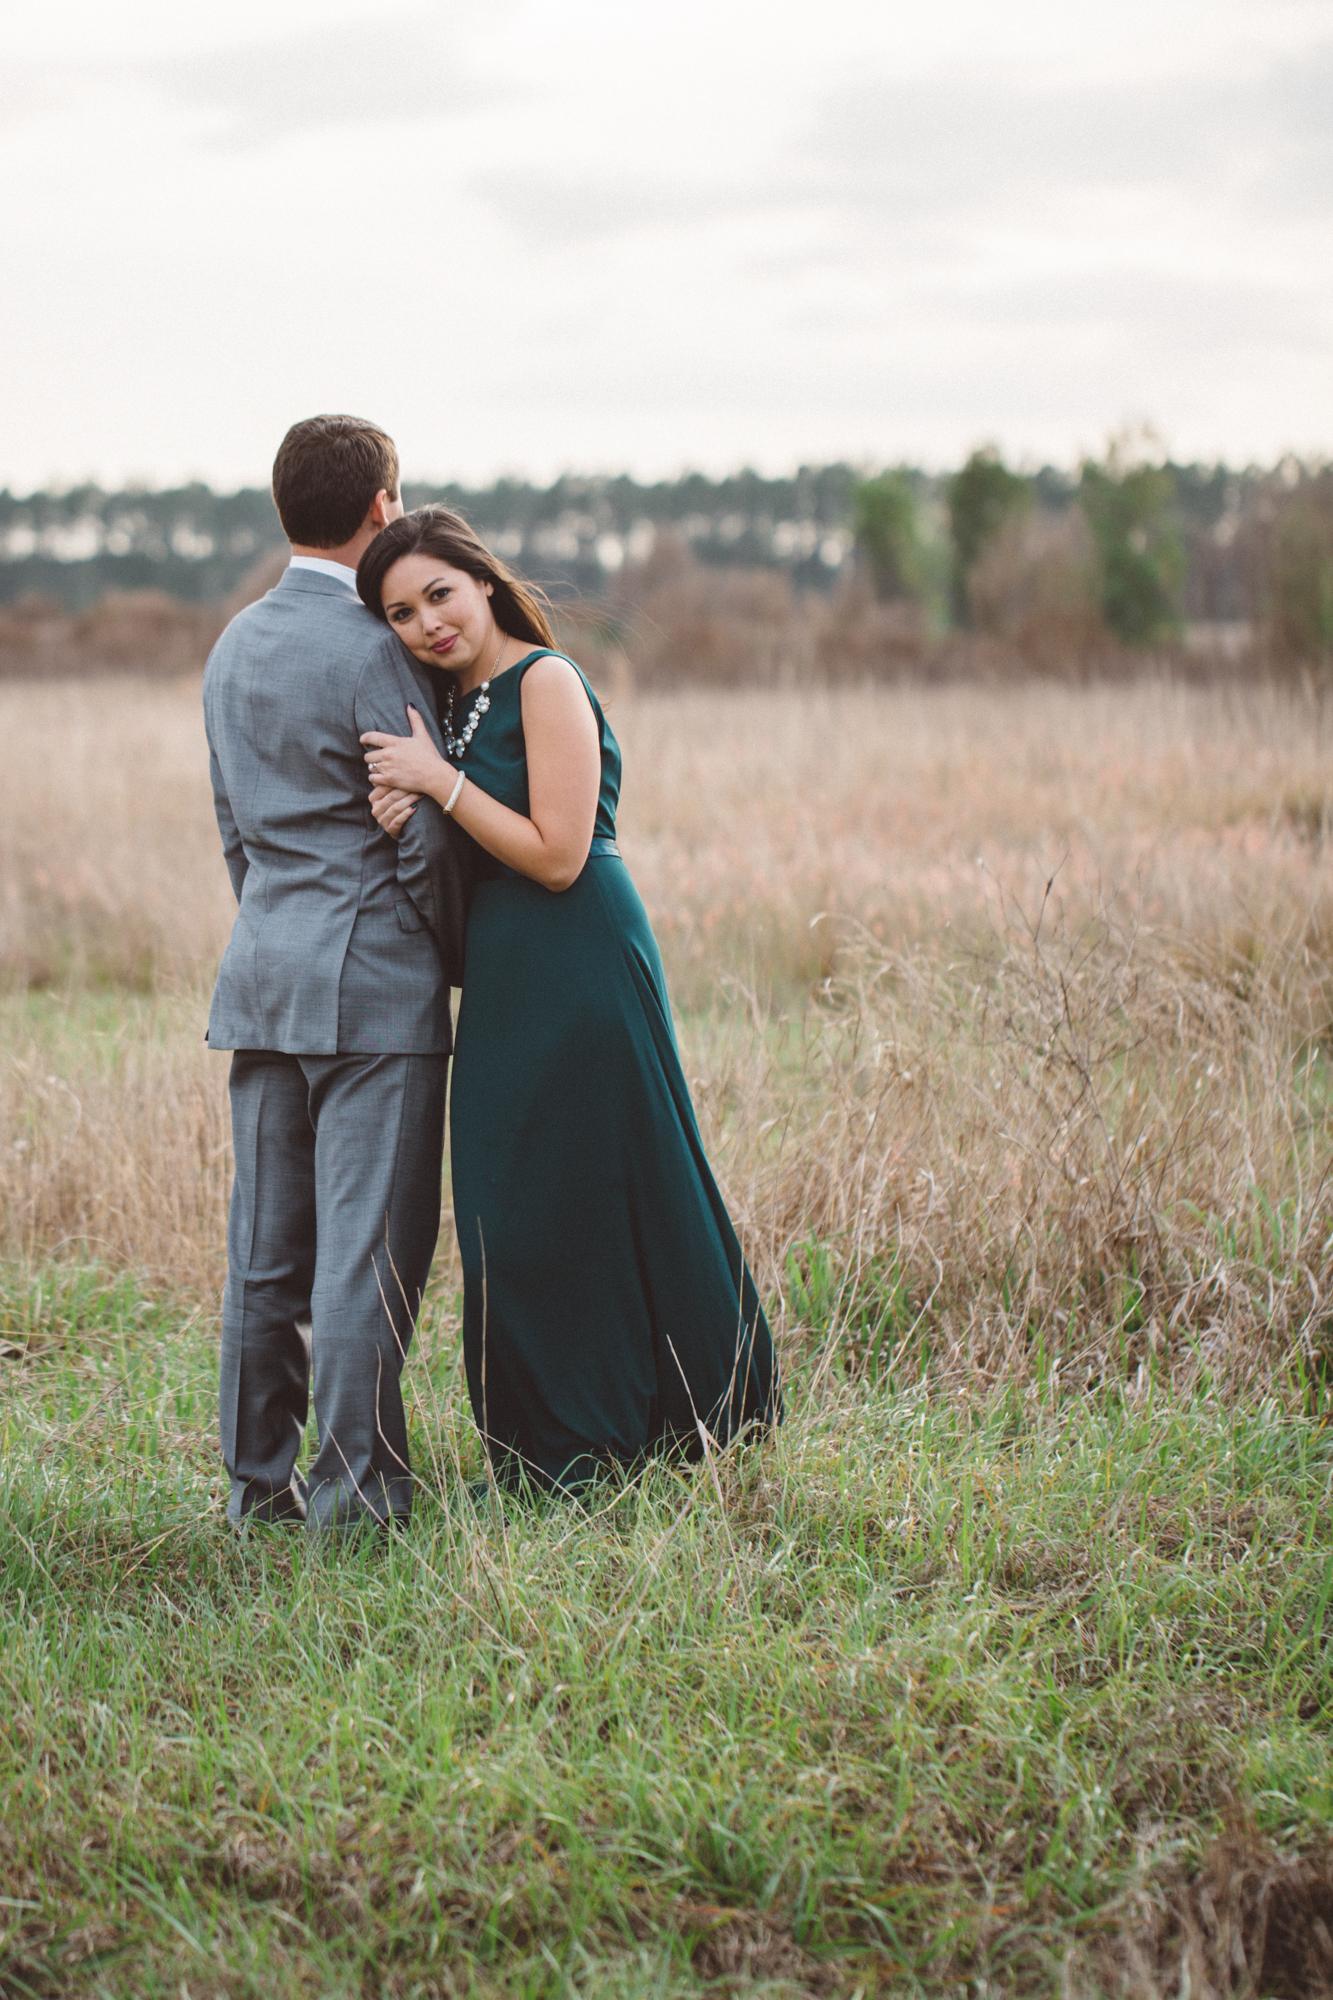 Orlando Engagement Photographer-35.jpg